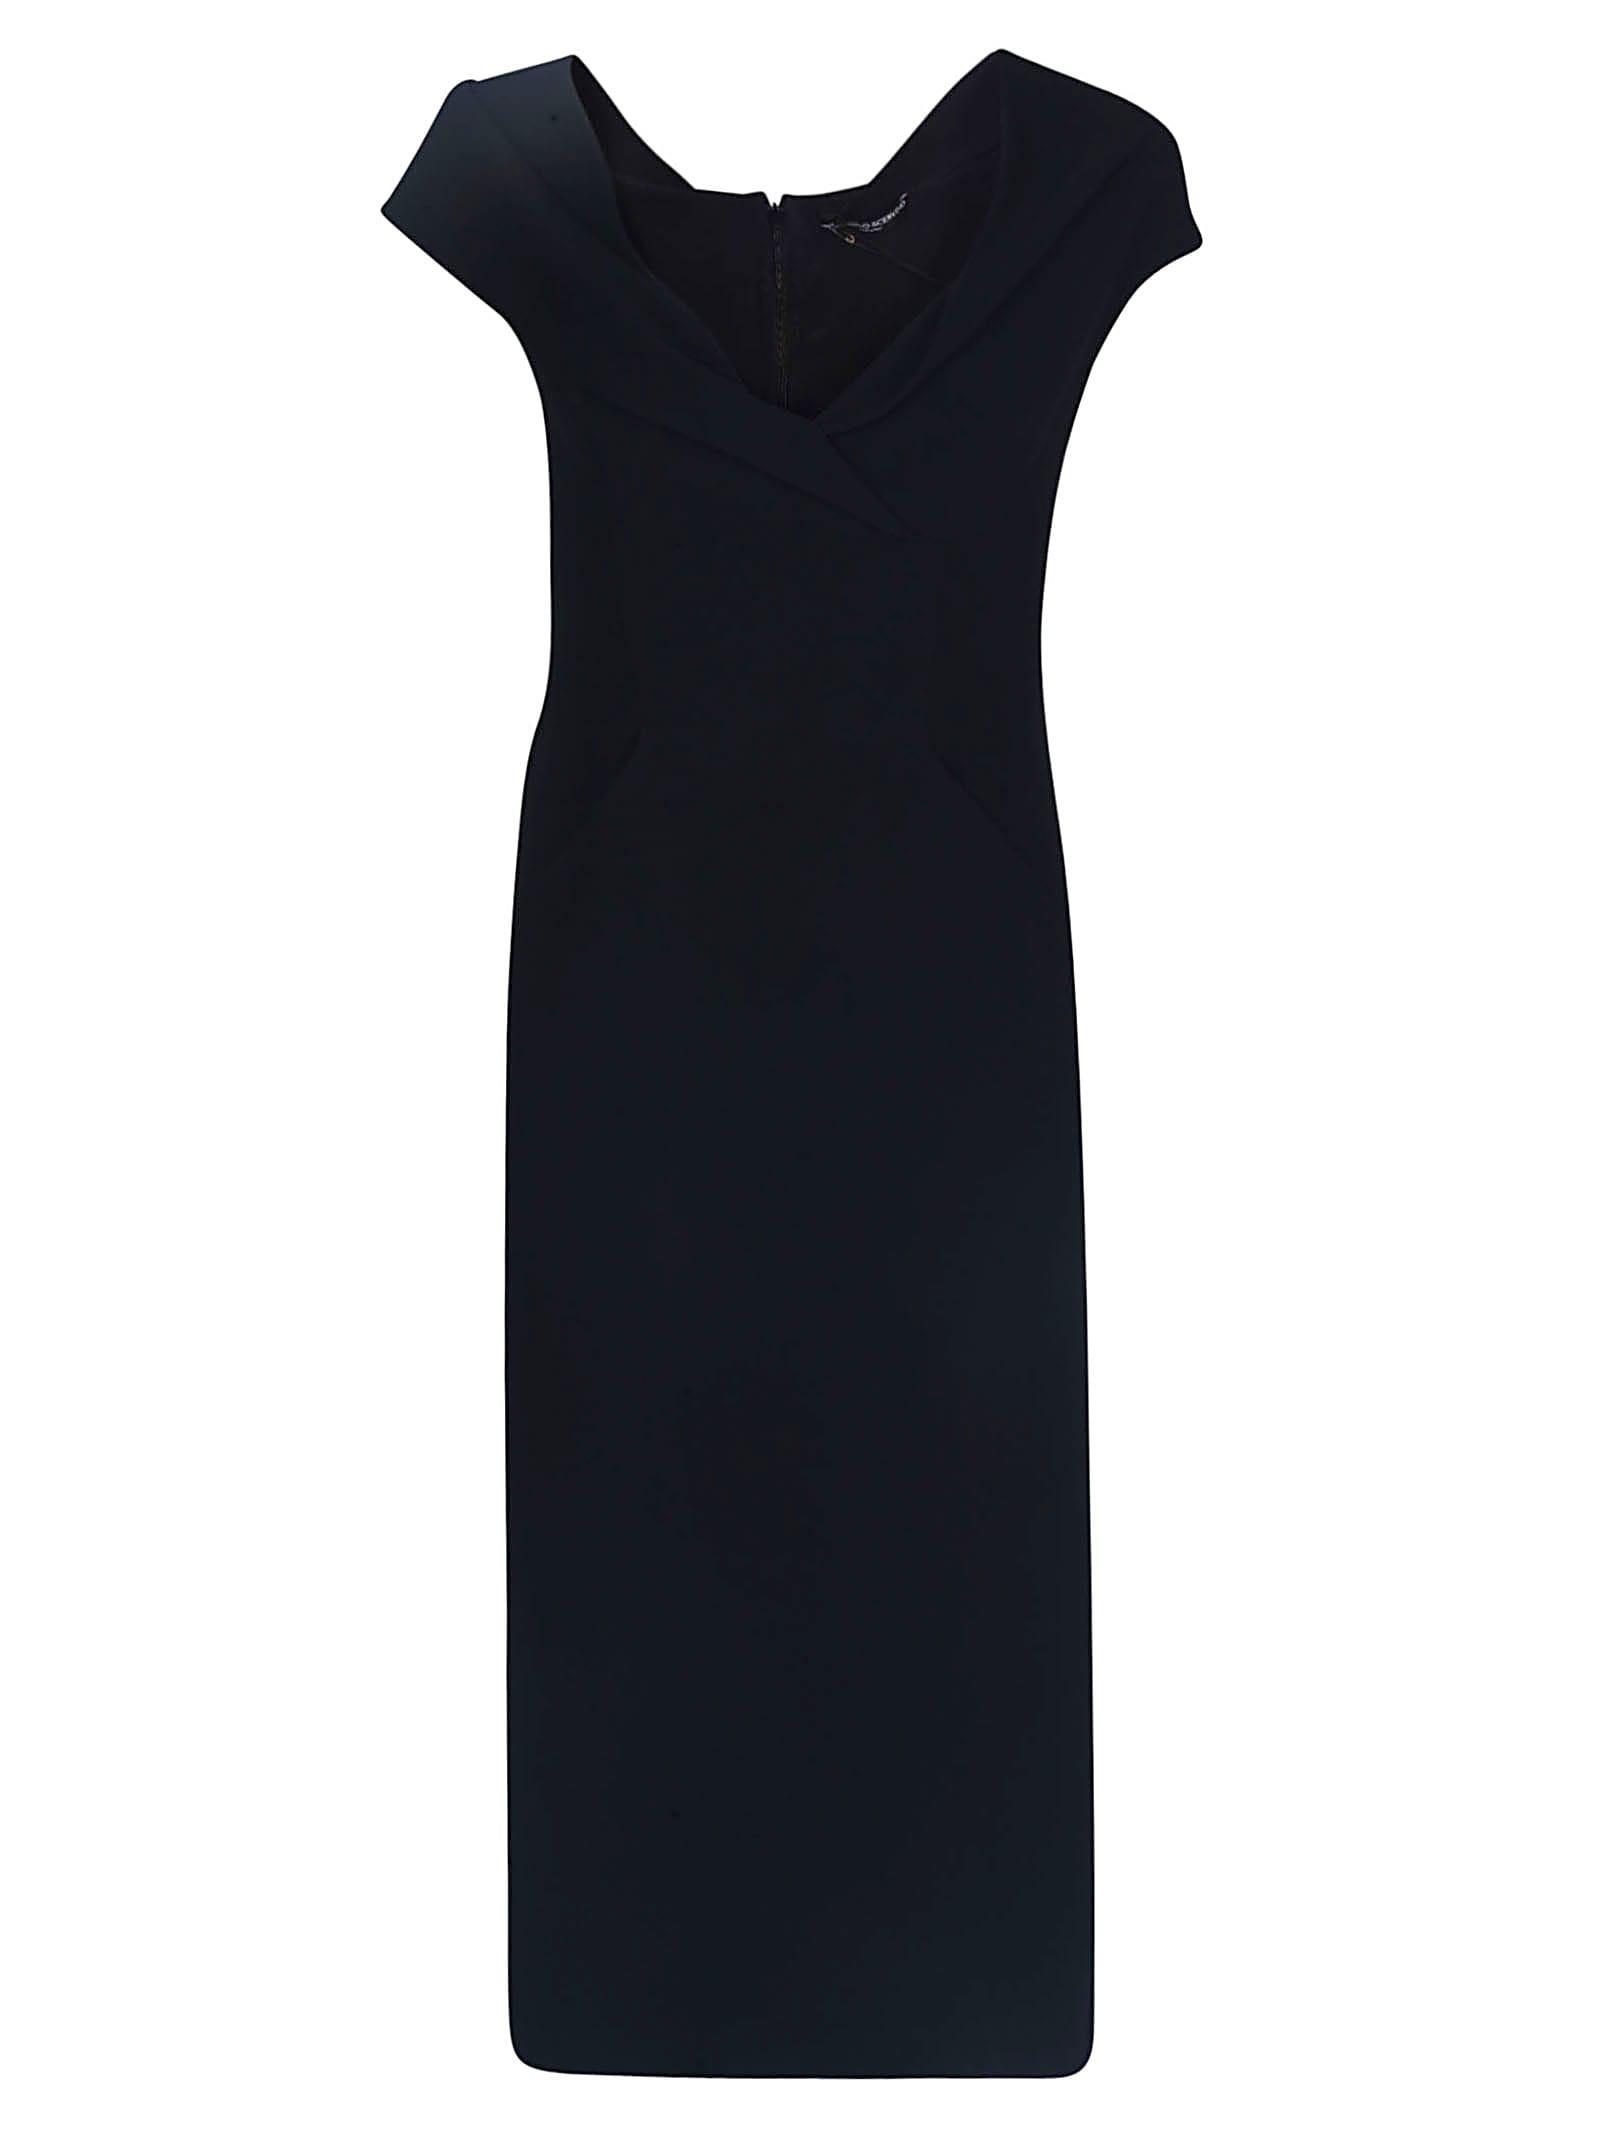 Buy Ermanno Scervino V-neck Maxi Dress online, shop Ermanno Scervino with free shipping